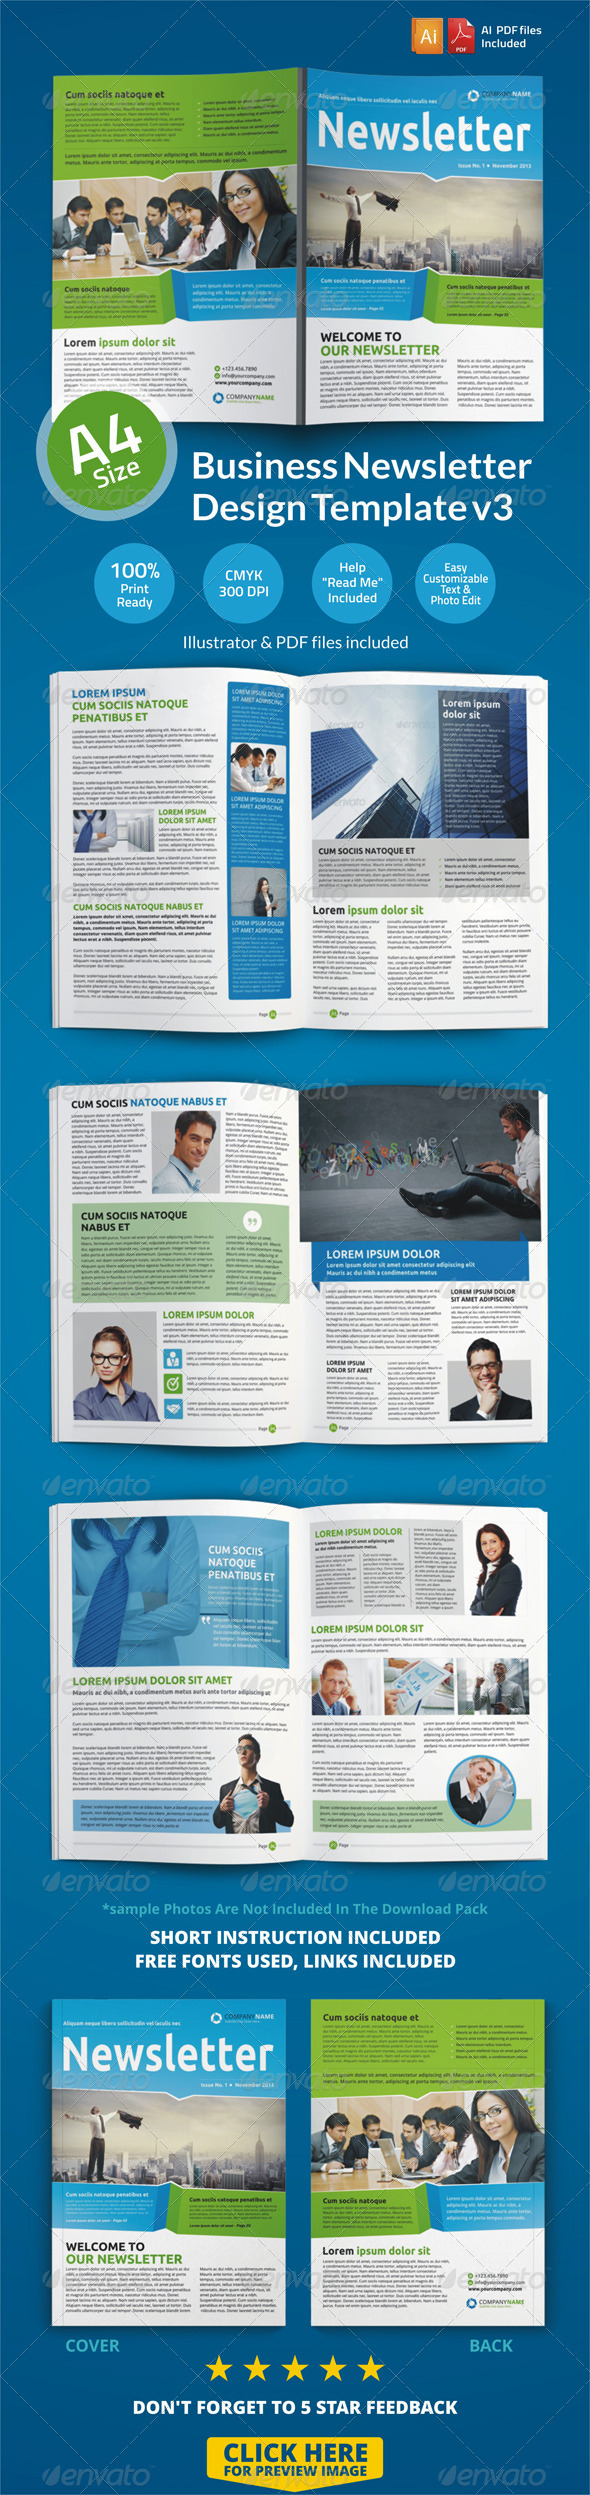 GraphicRiver Newsletter Design Template v3 6686906